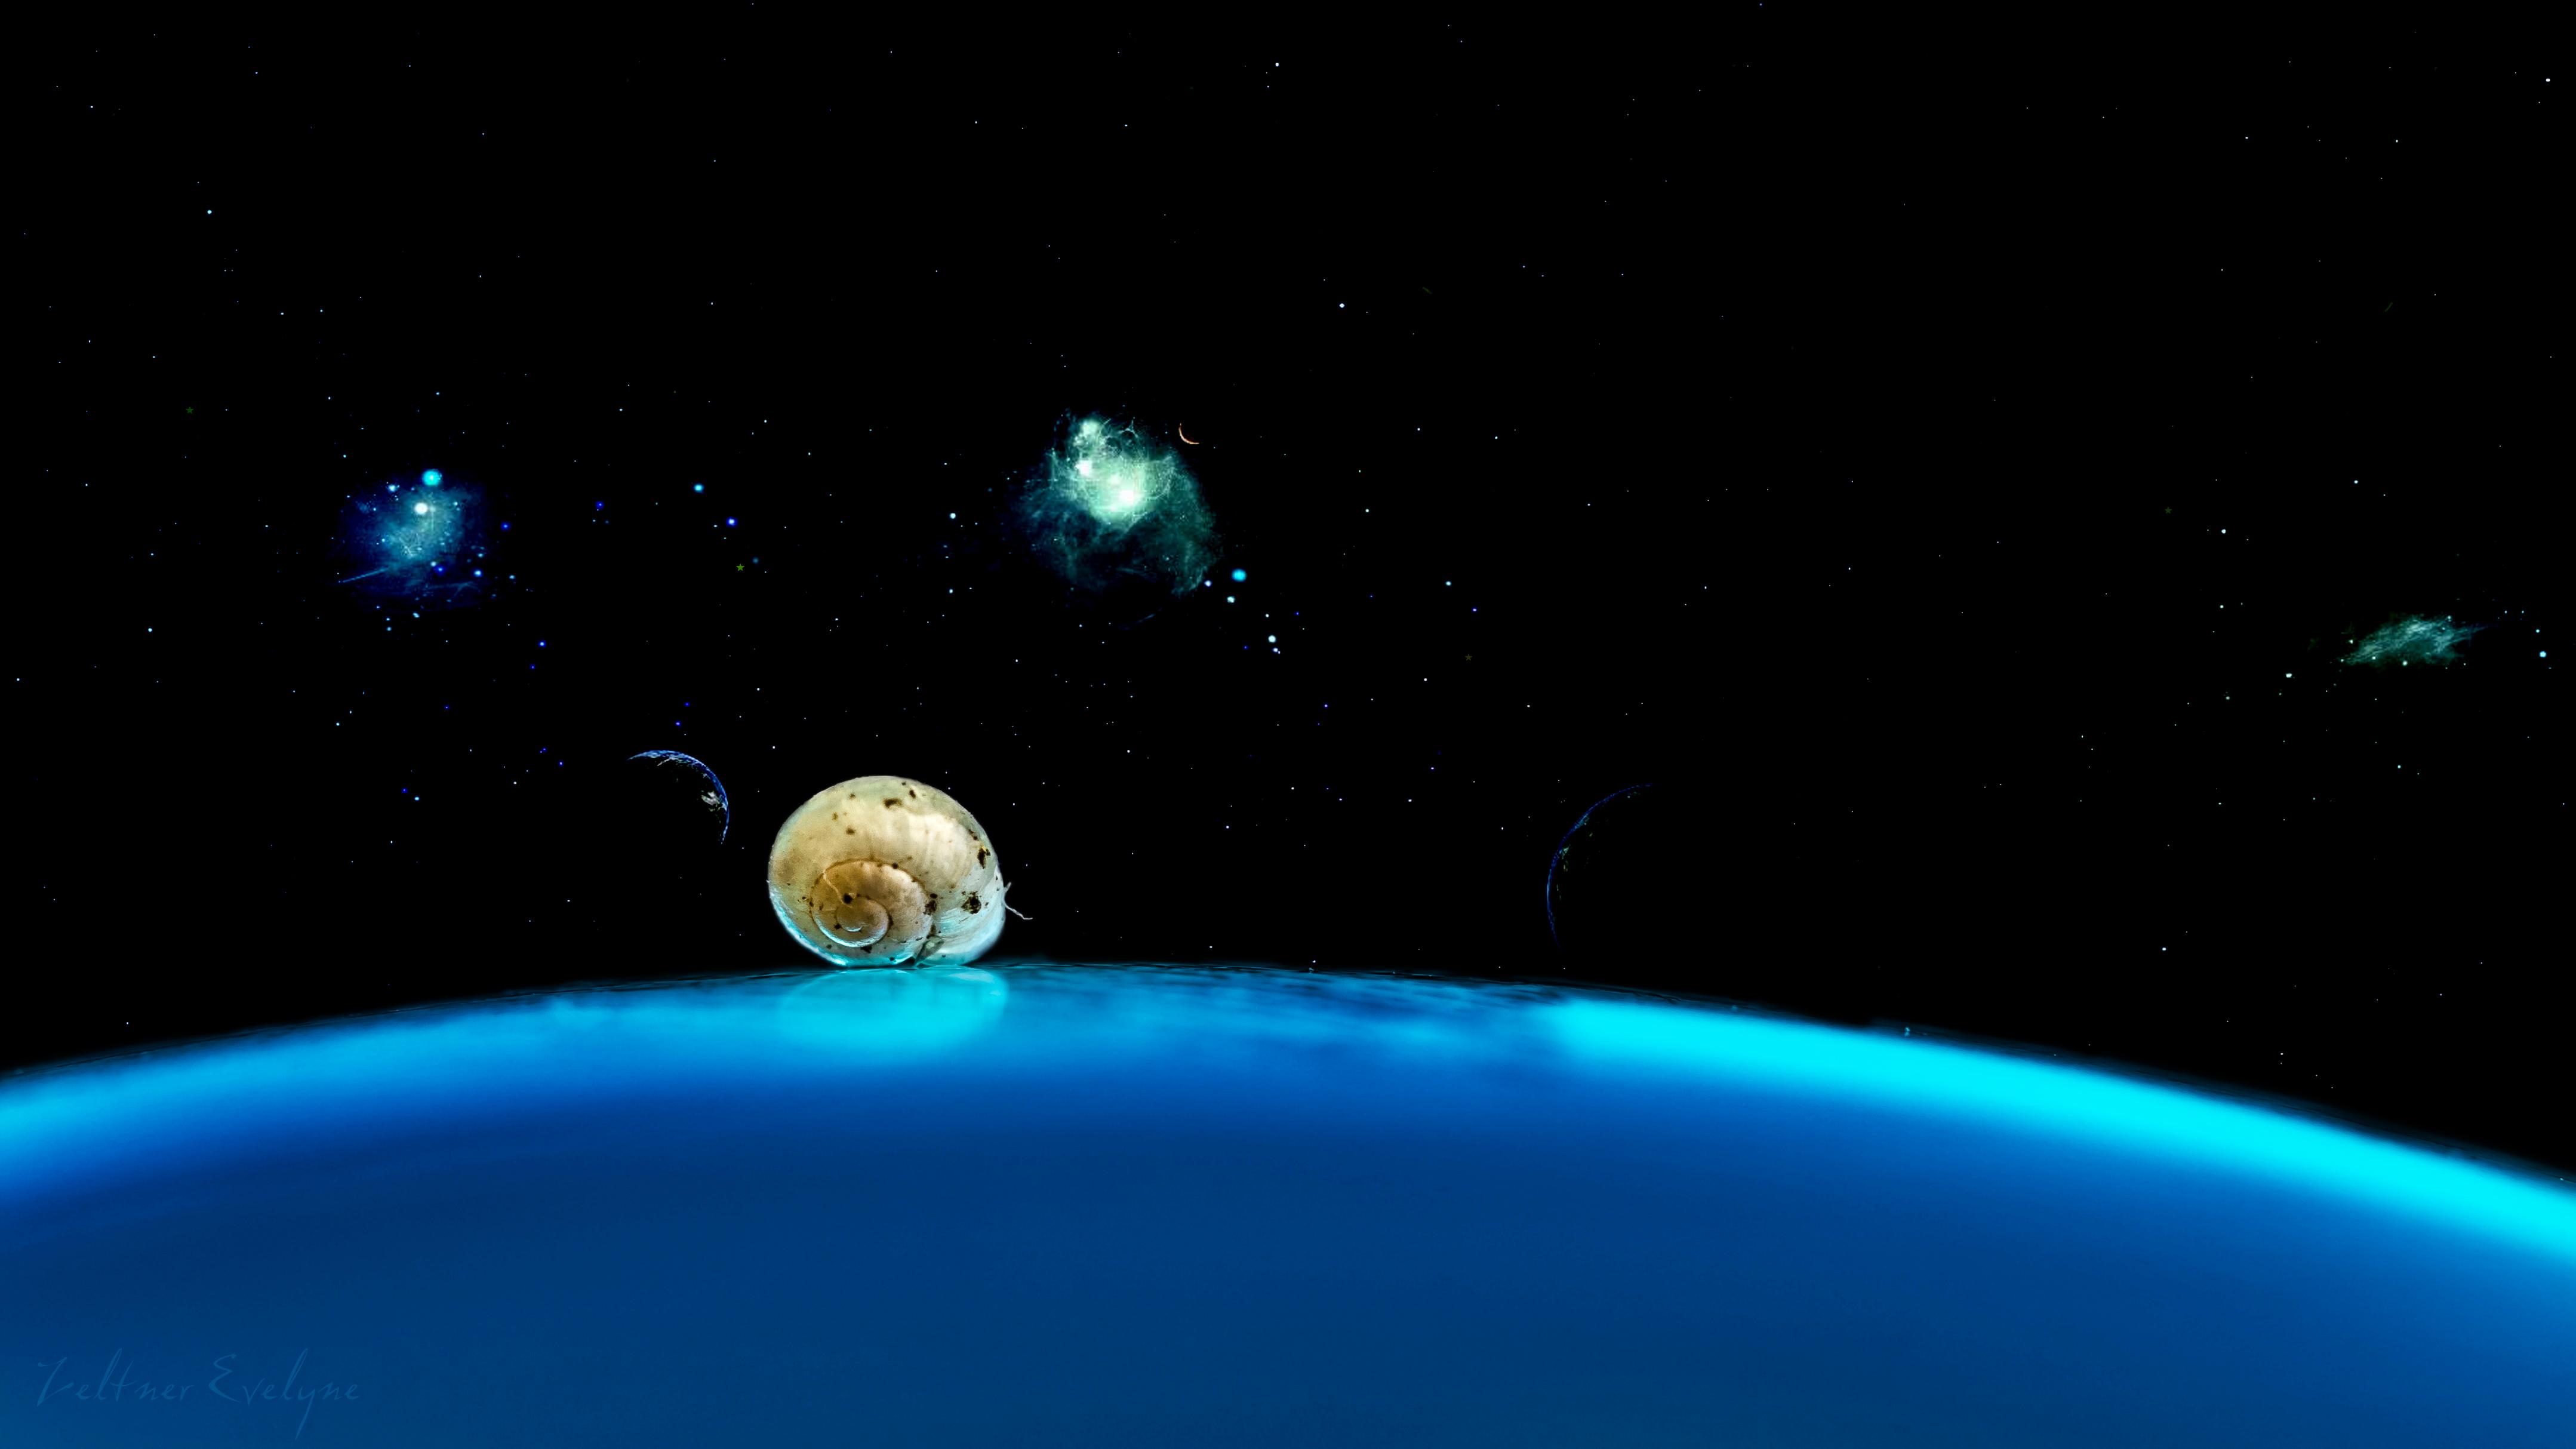 Planète escargot